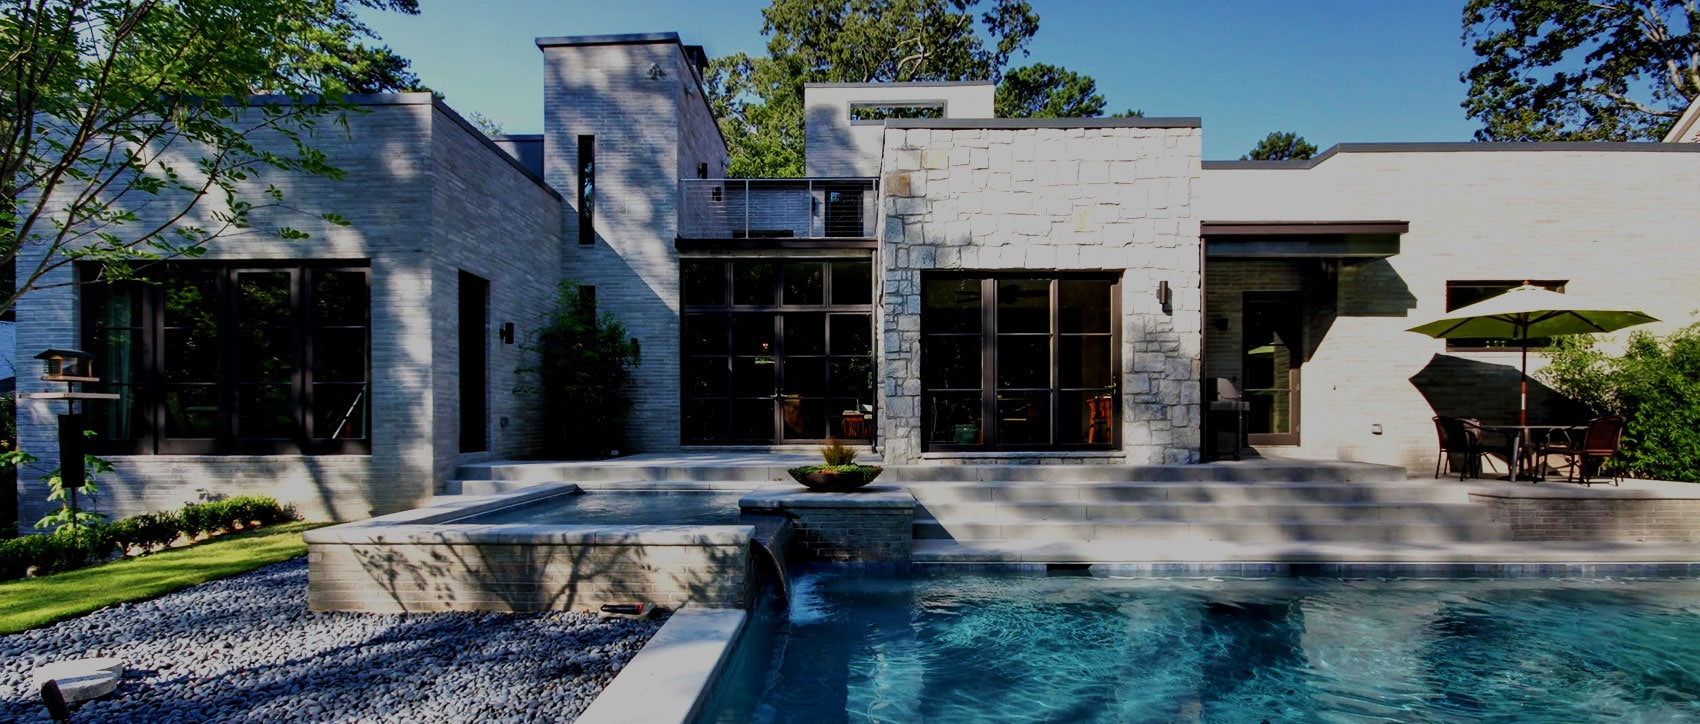 atlanta-modern-home2